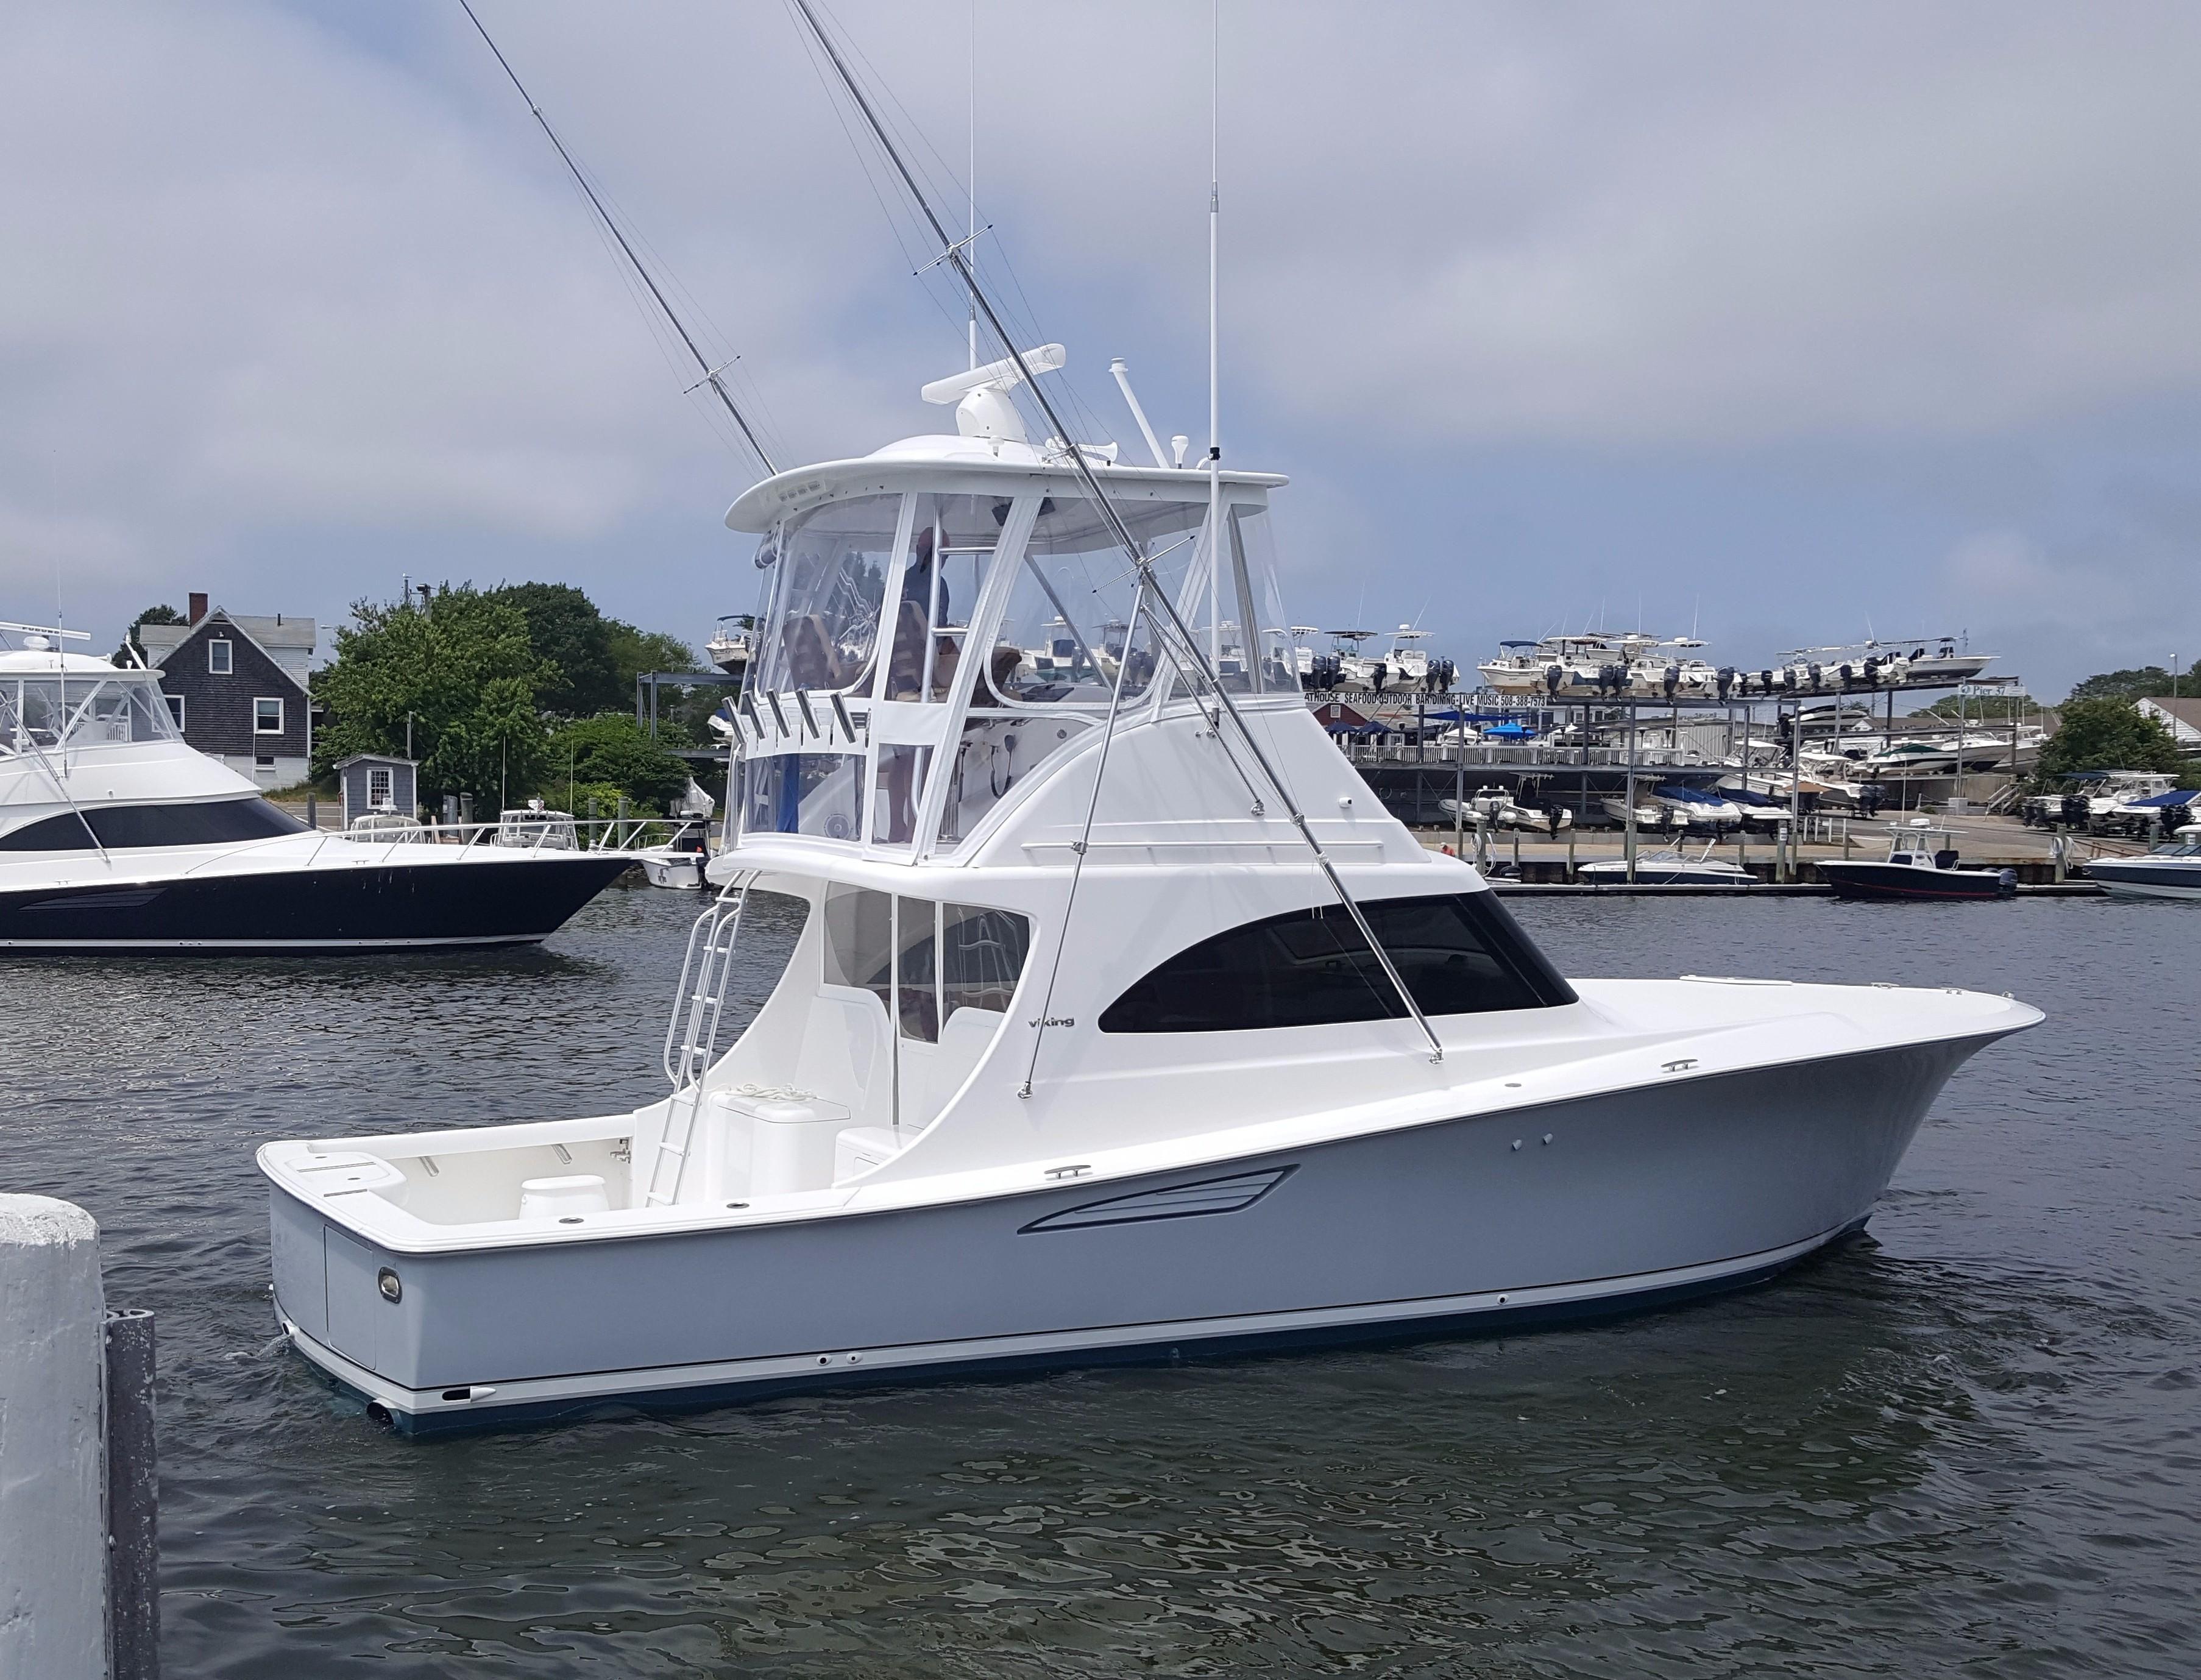 2019 viking 37 billfish power boat for sale www yachtworld com